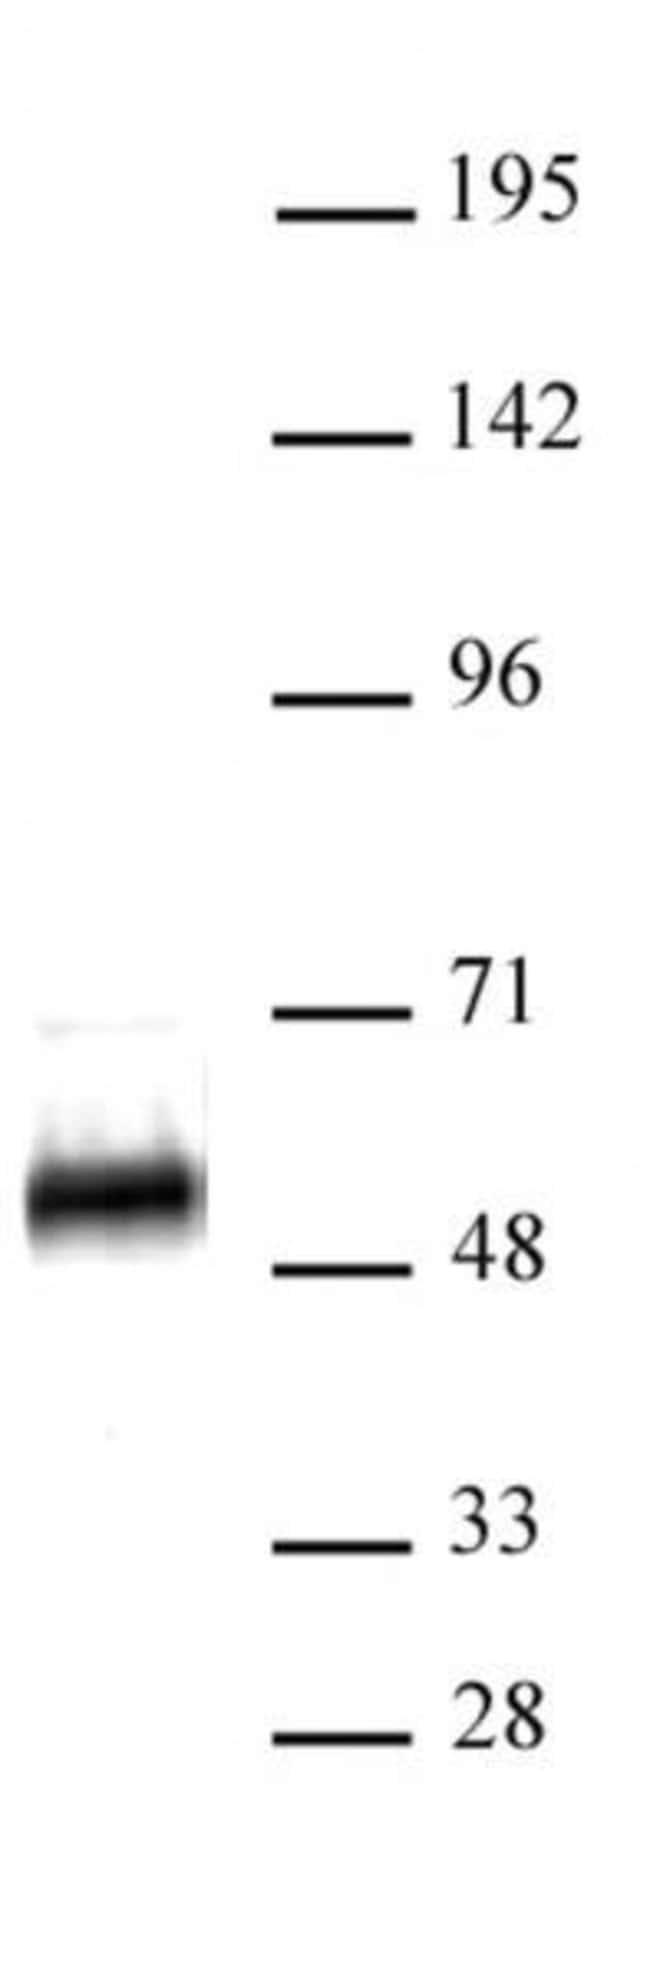 p53 Rabbit anti-Human, Unconjugated, Polyclonal, Active Motif:Antibodies:Primary